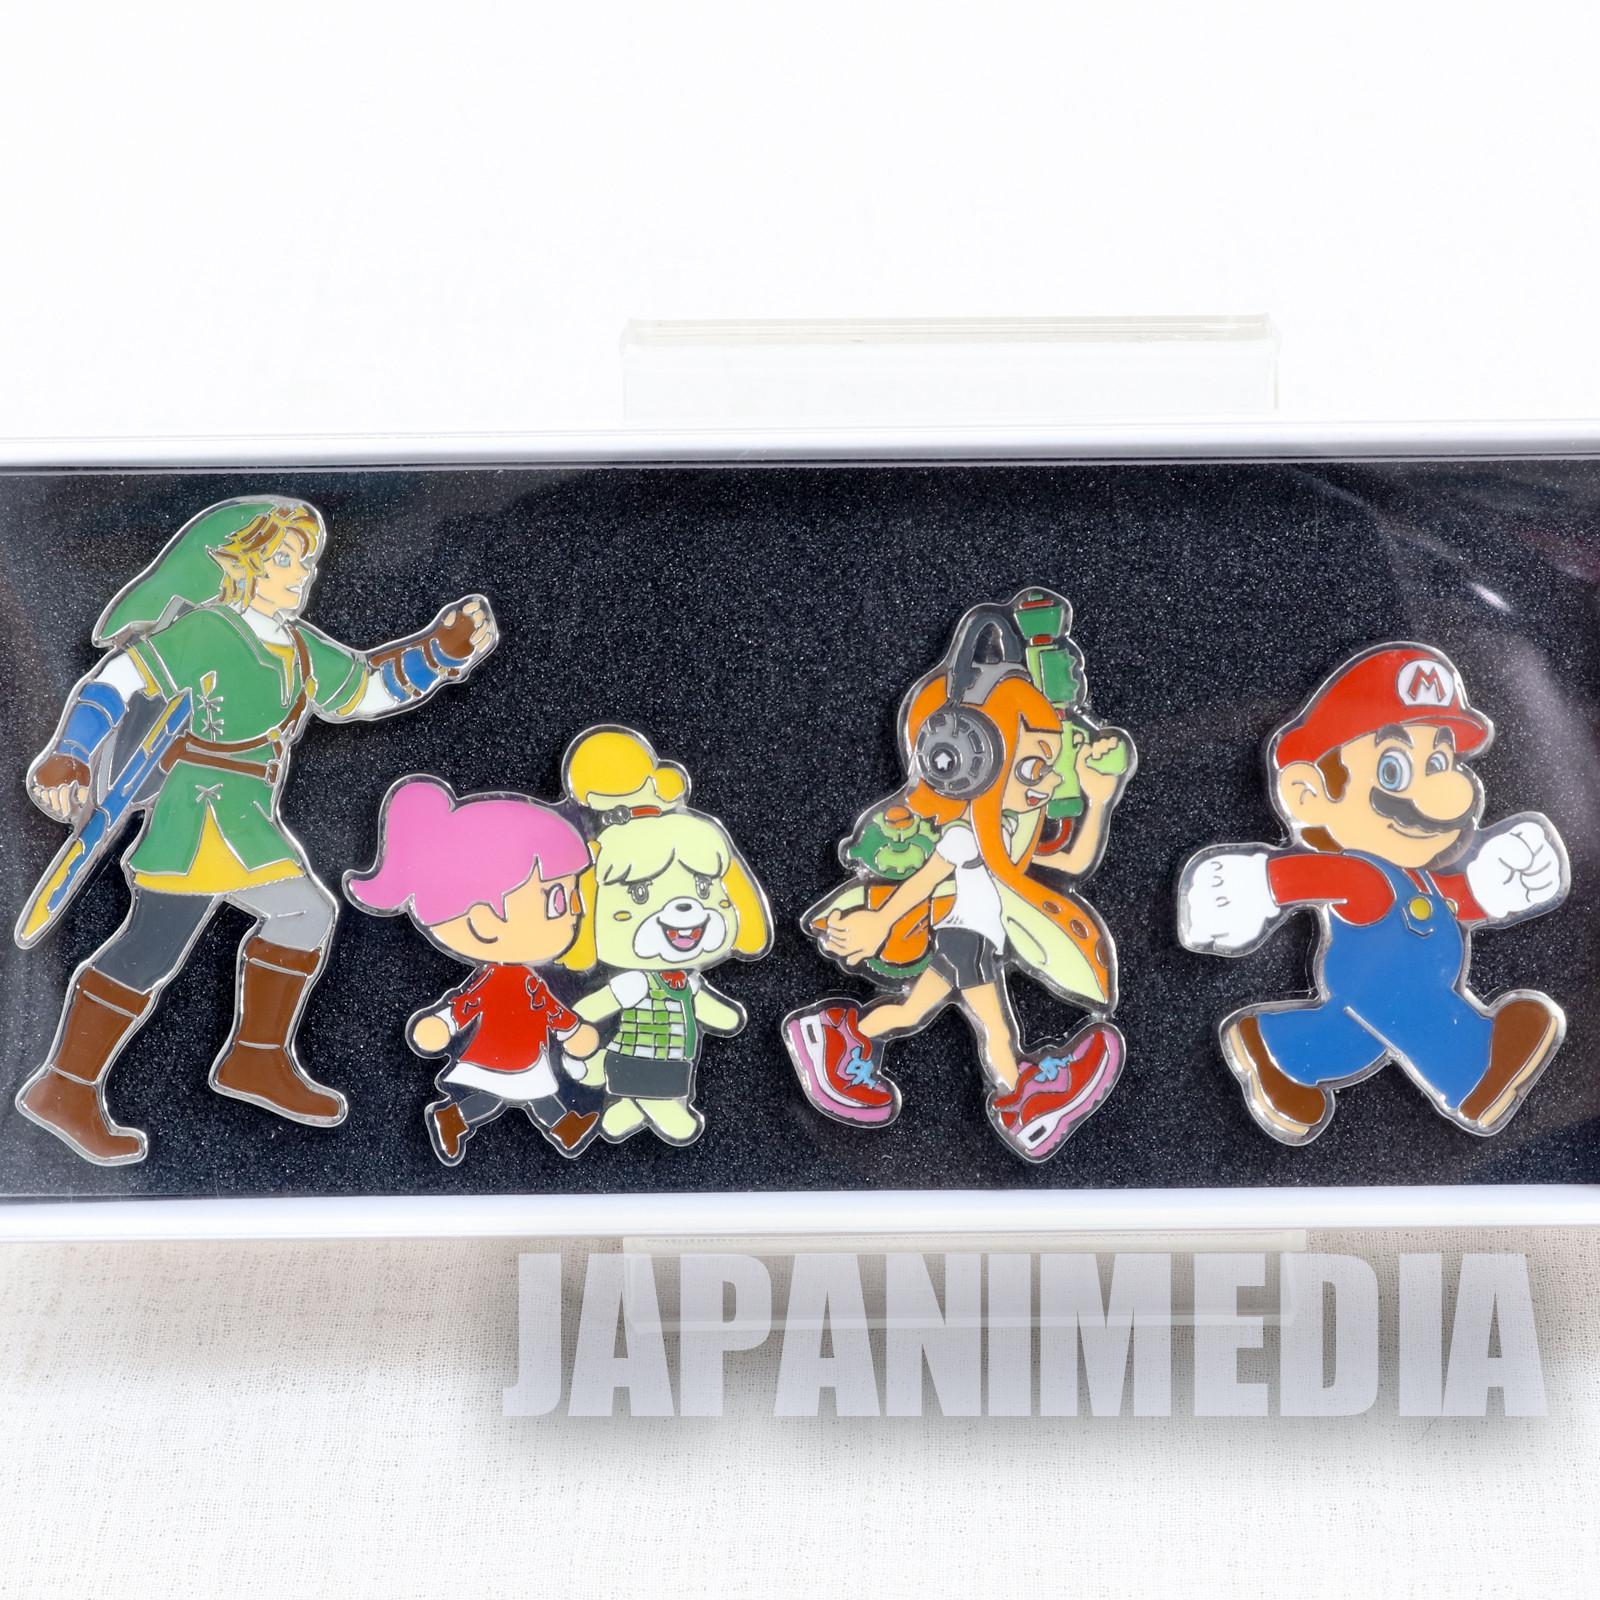 Nintendo Tokyo Pins 4pc Set Mario Splatoon Animal Crossing Legend of Zelda JAPAN